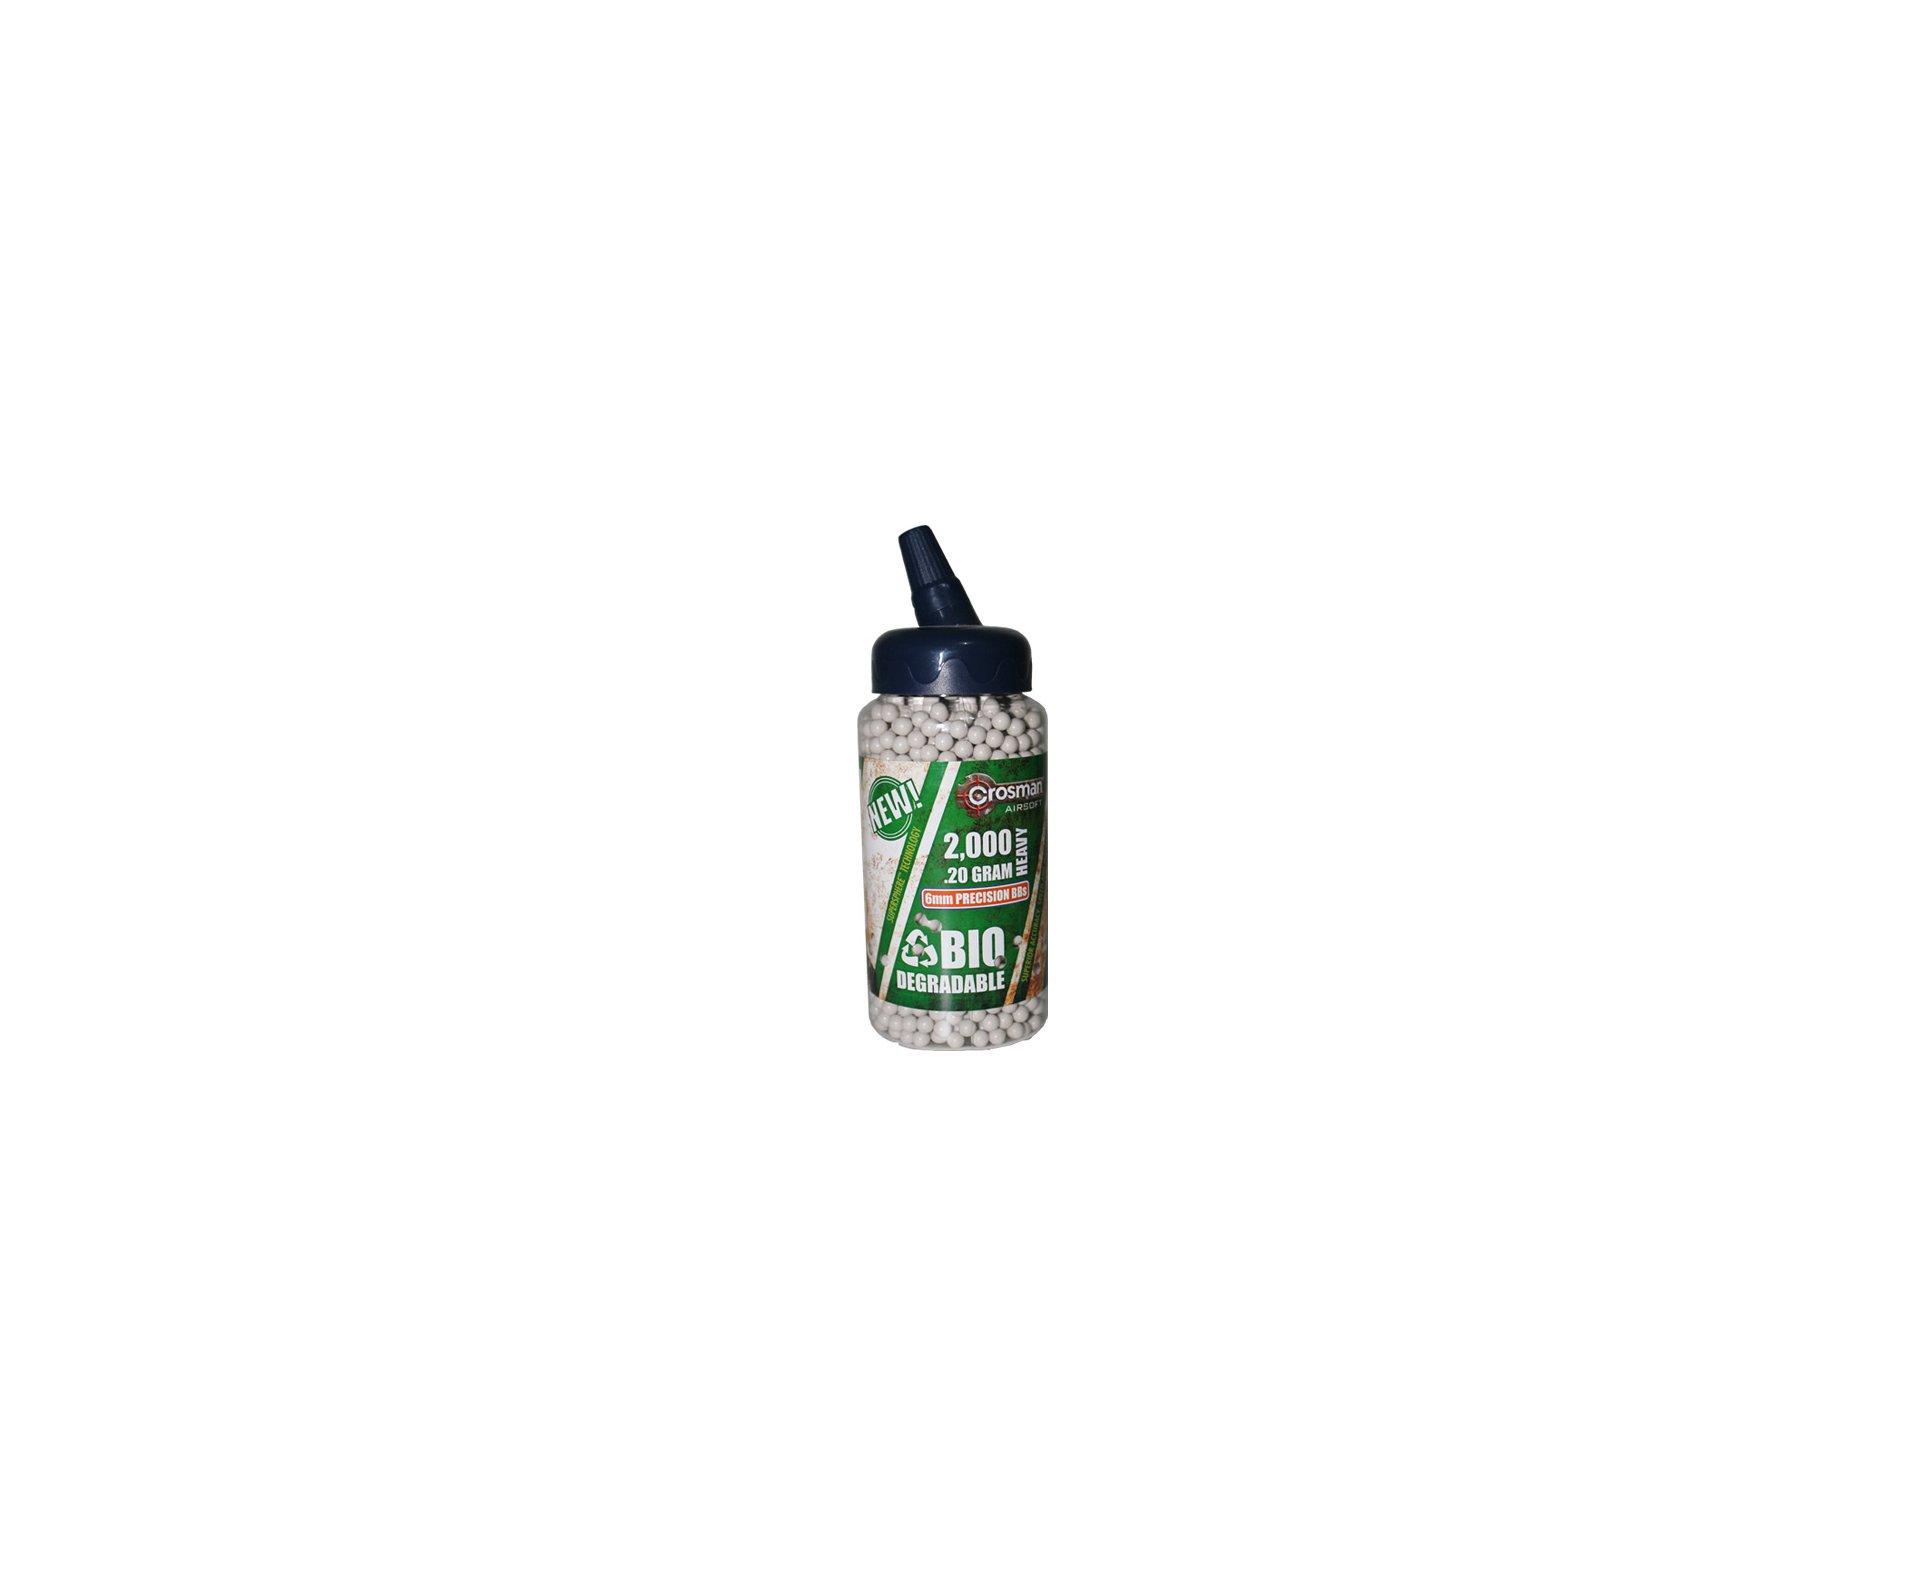 Esfera Plástica Verde Biodegradável - 2000 Unidades / 0,20 G - Crosman